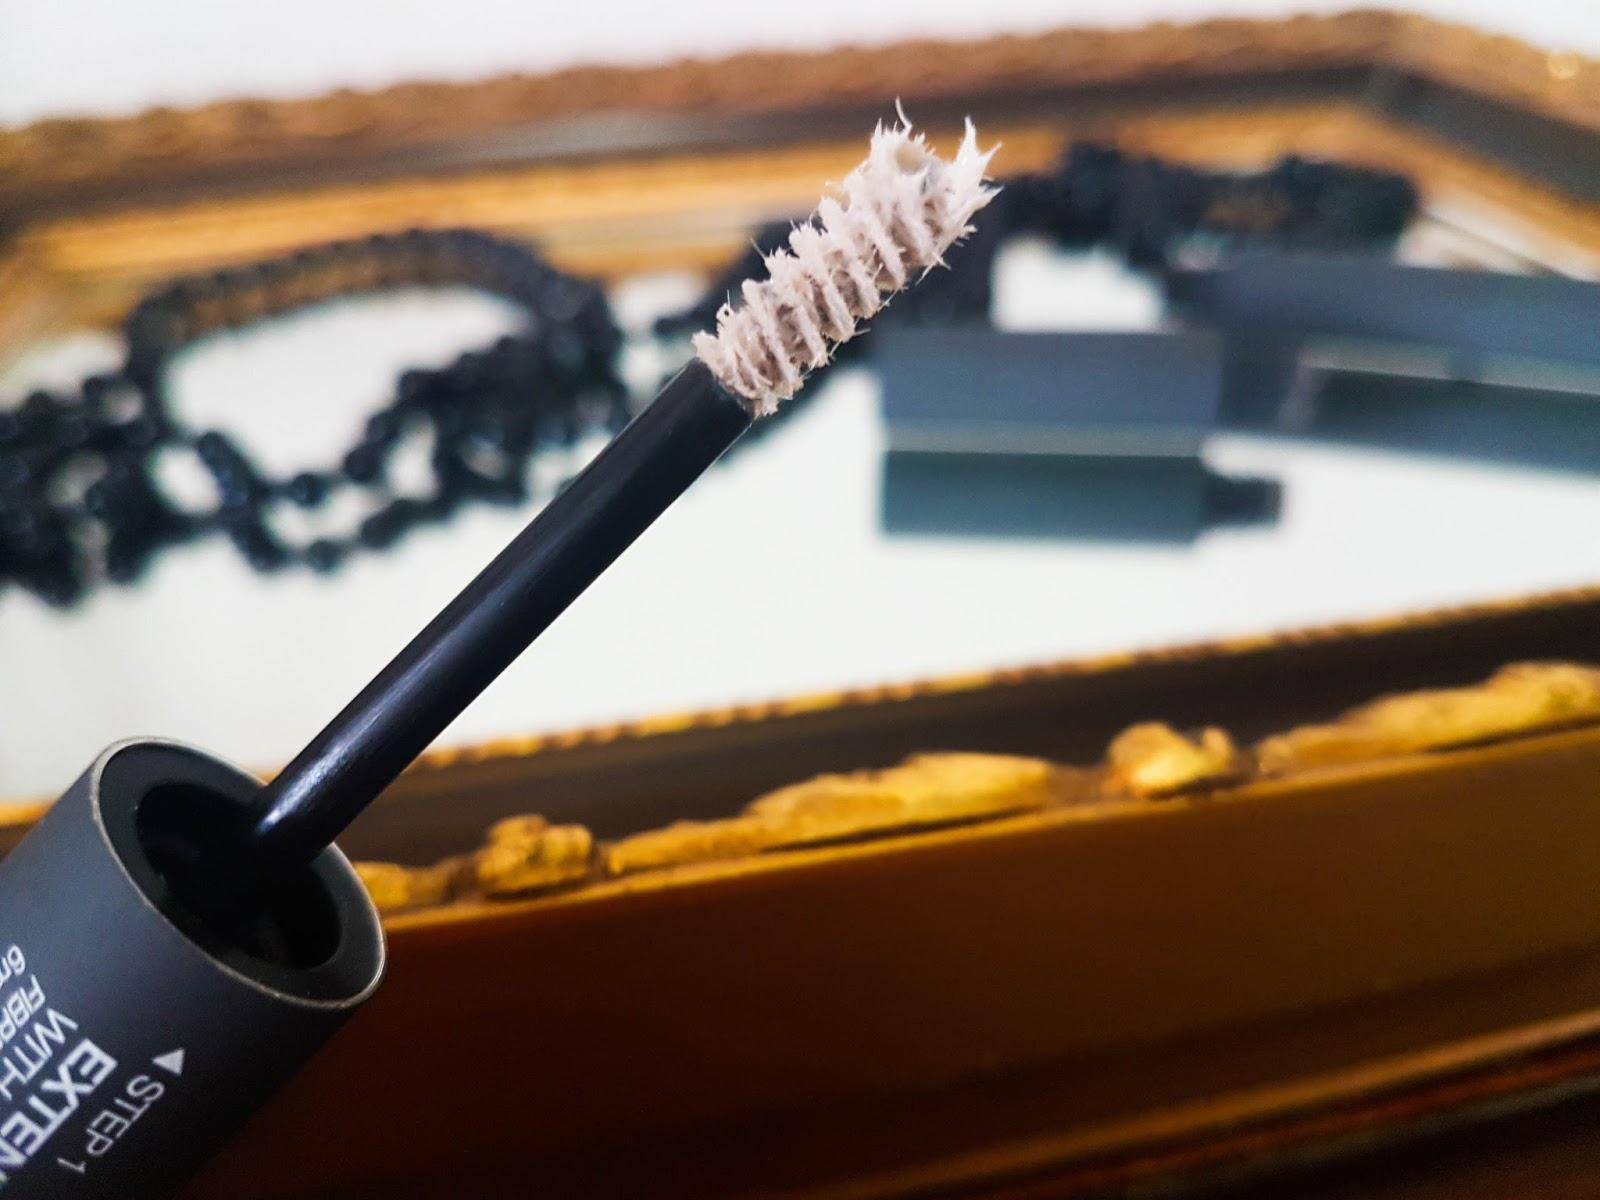 avis-mascara-eyelash-extensions-in-a-bottle-lashfood-sephora-avant-apres-mama-syca-beaute